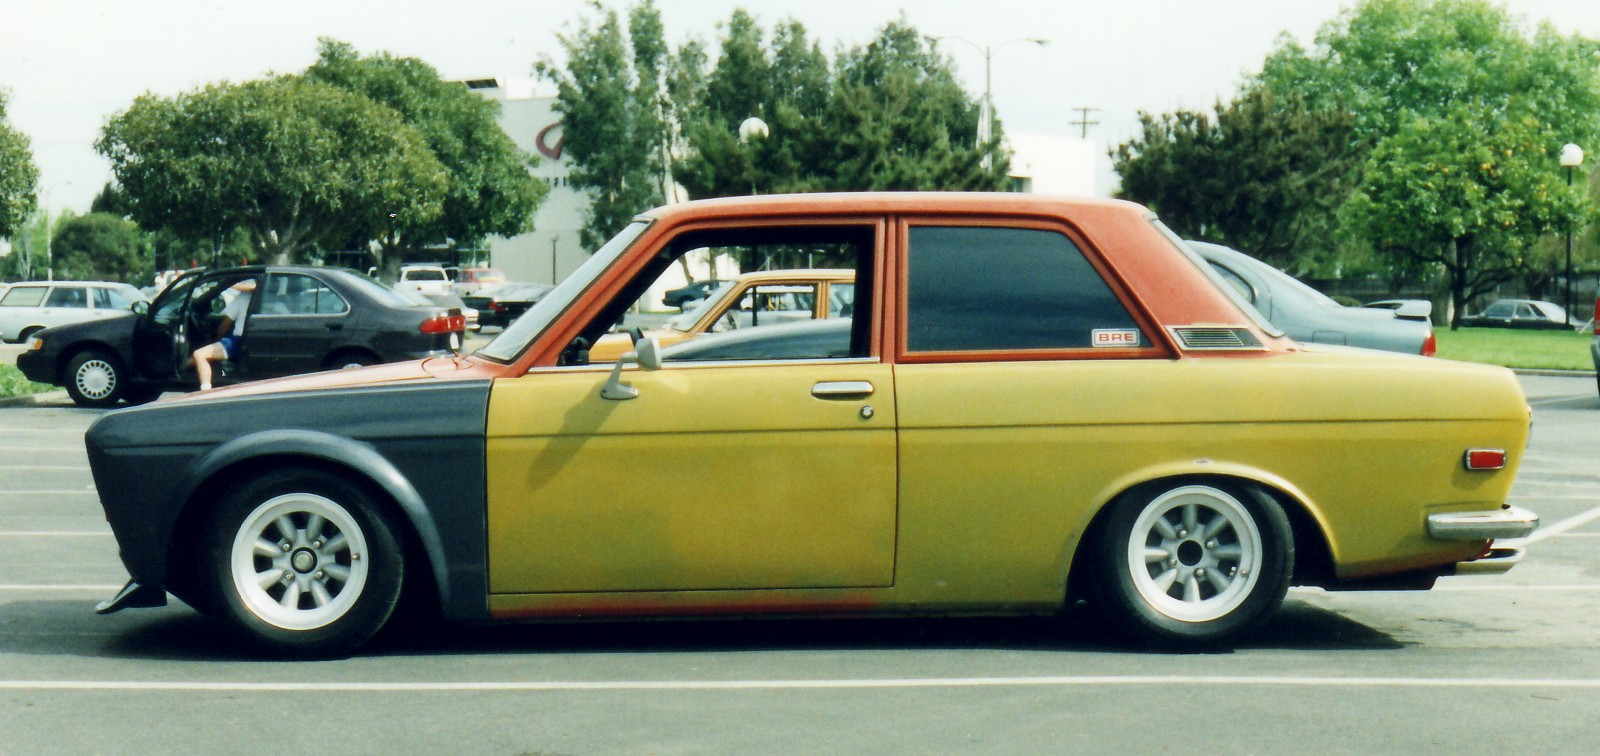 Leask 510